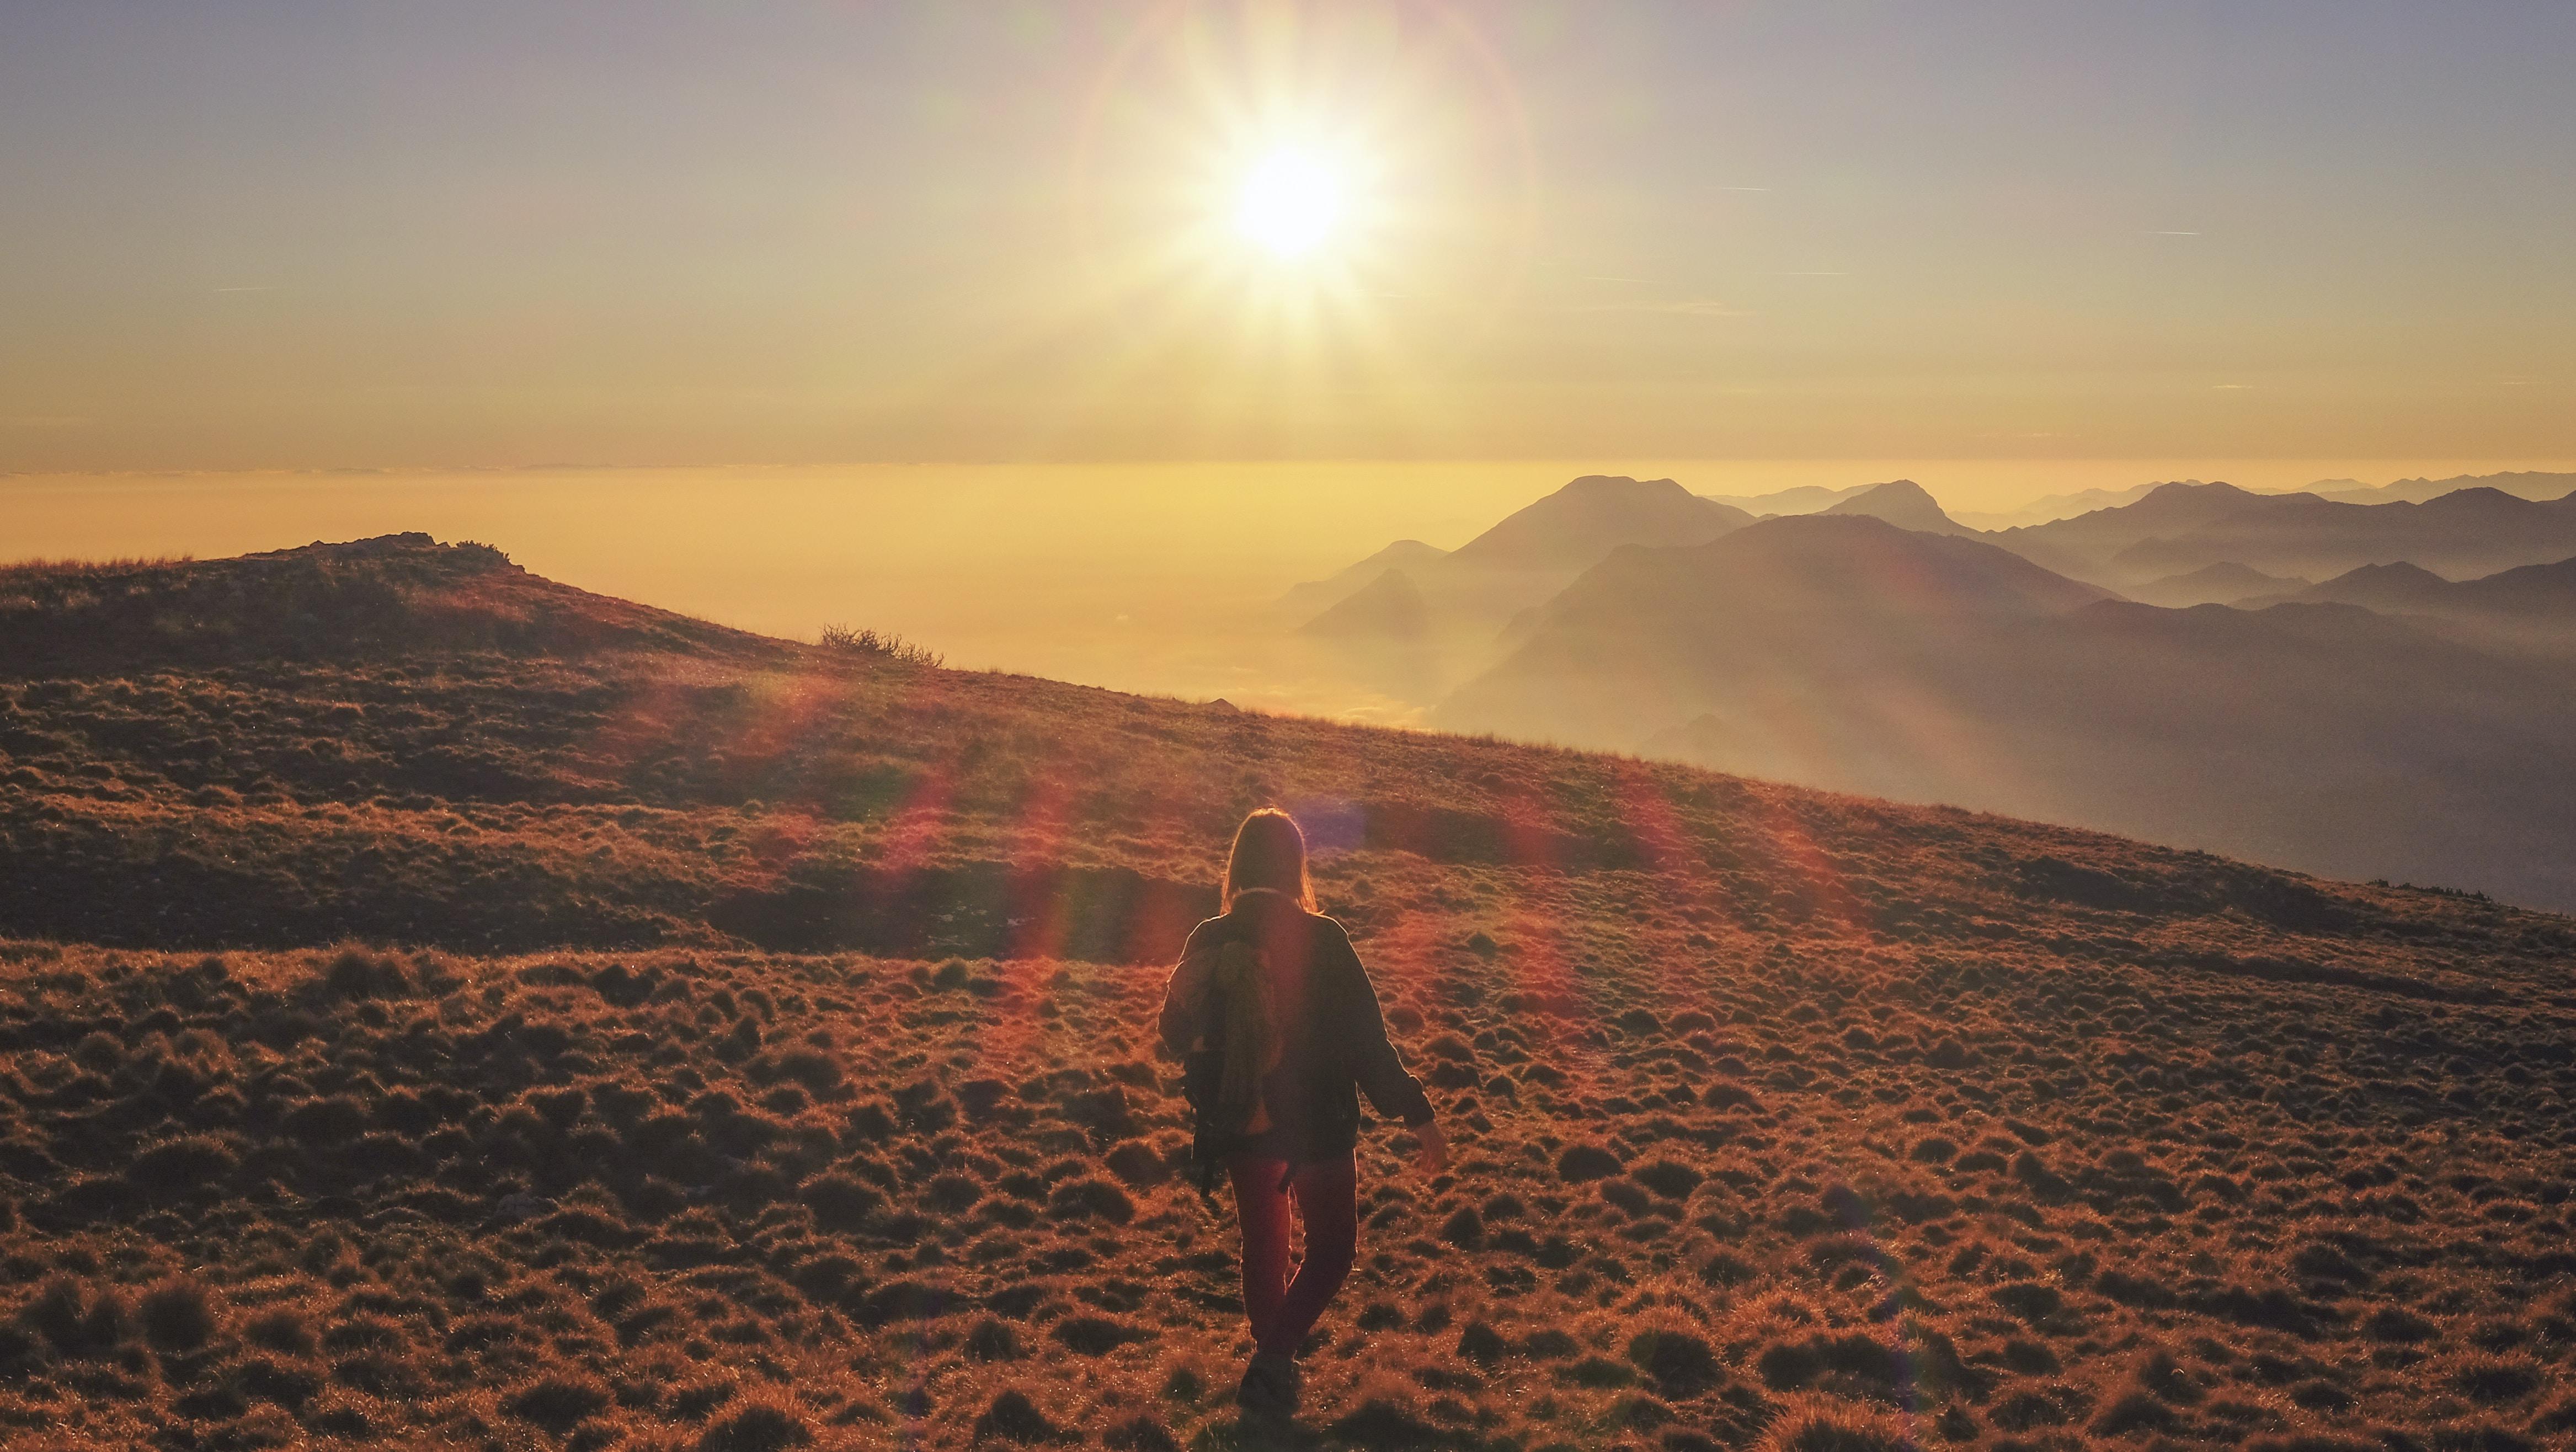 woman in blue jacket walking on desert during sunset